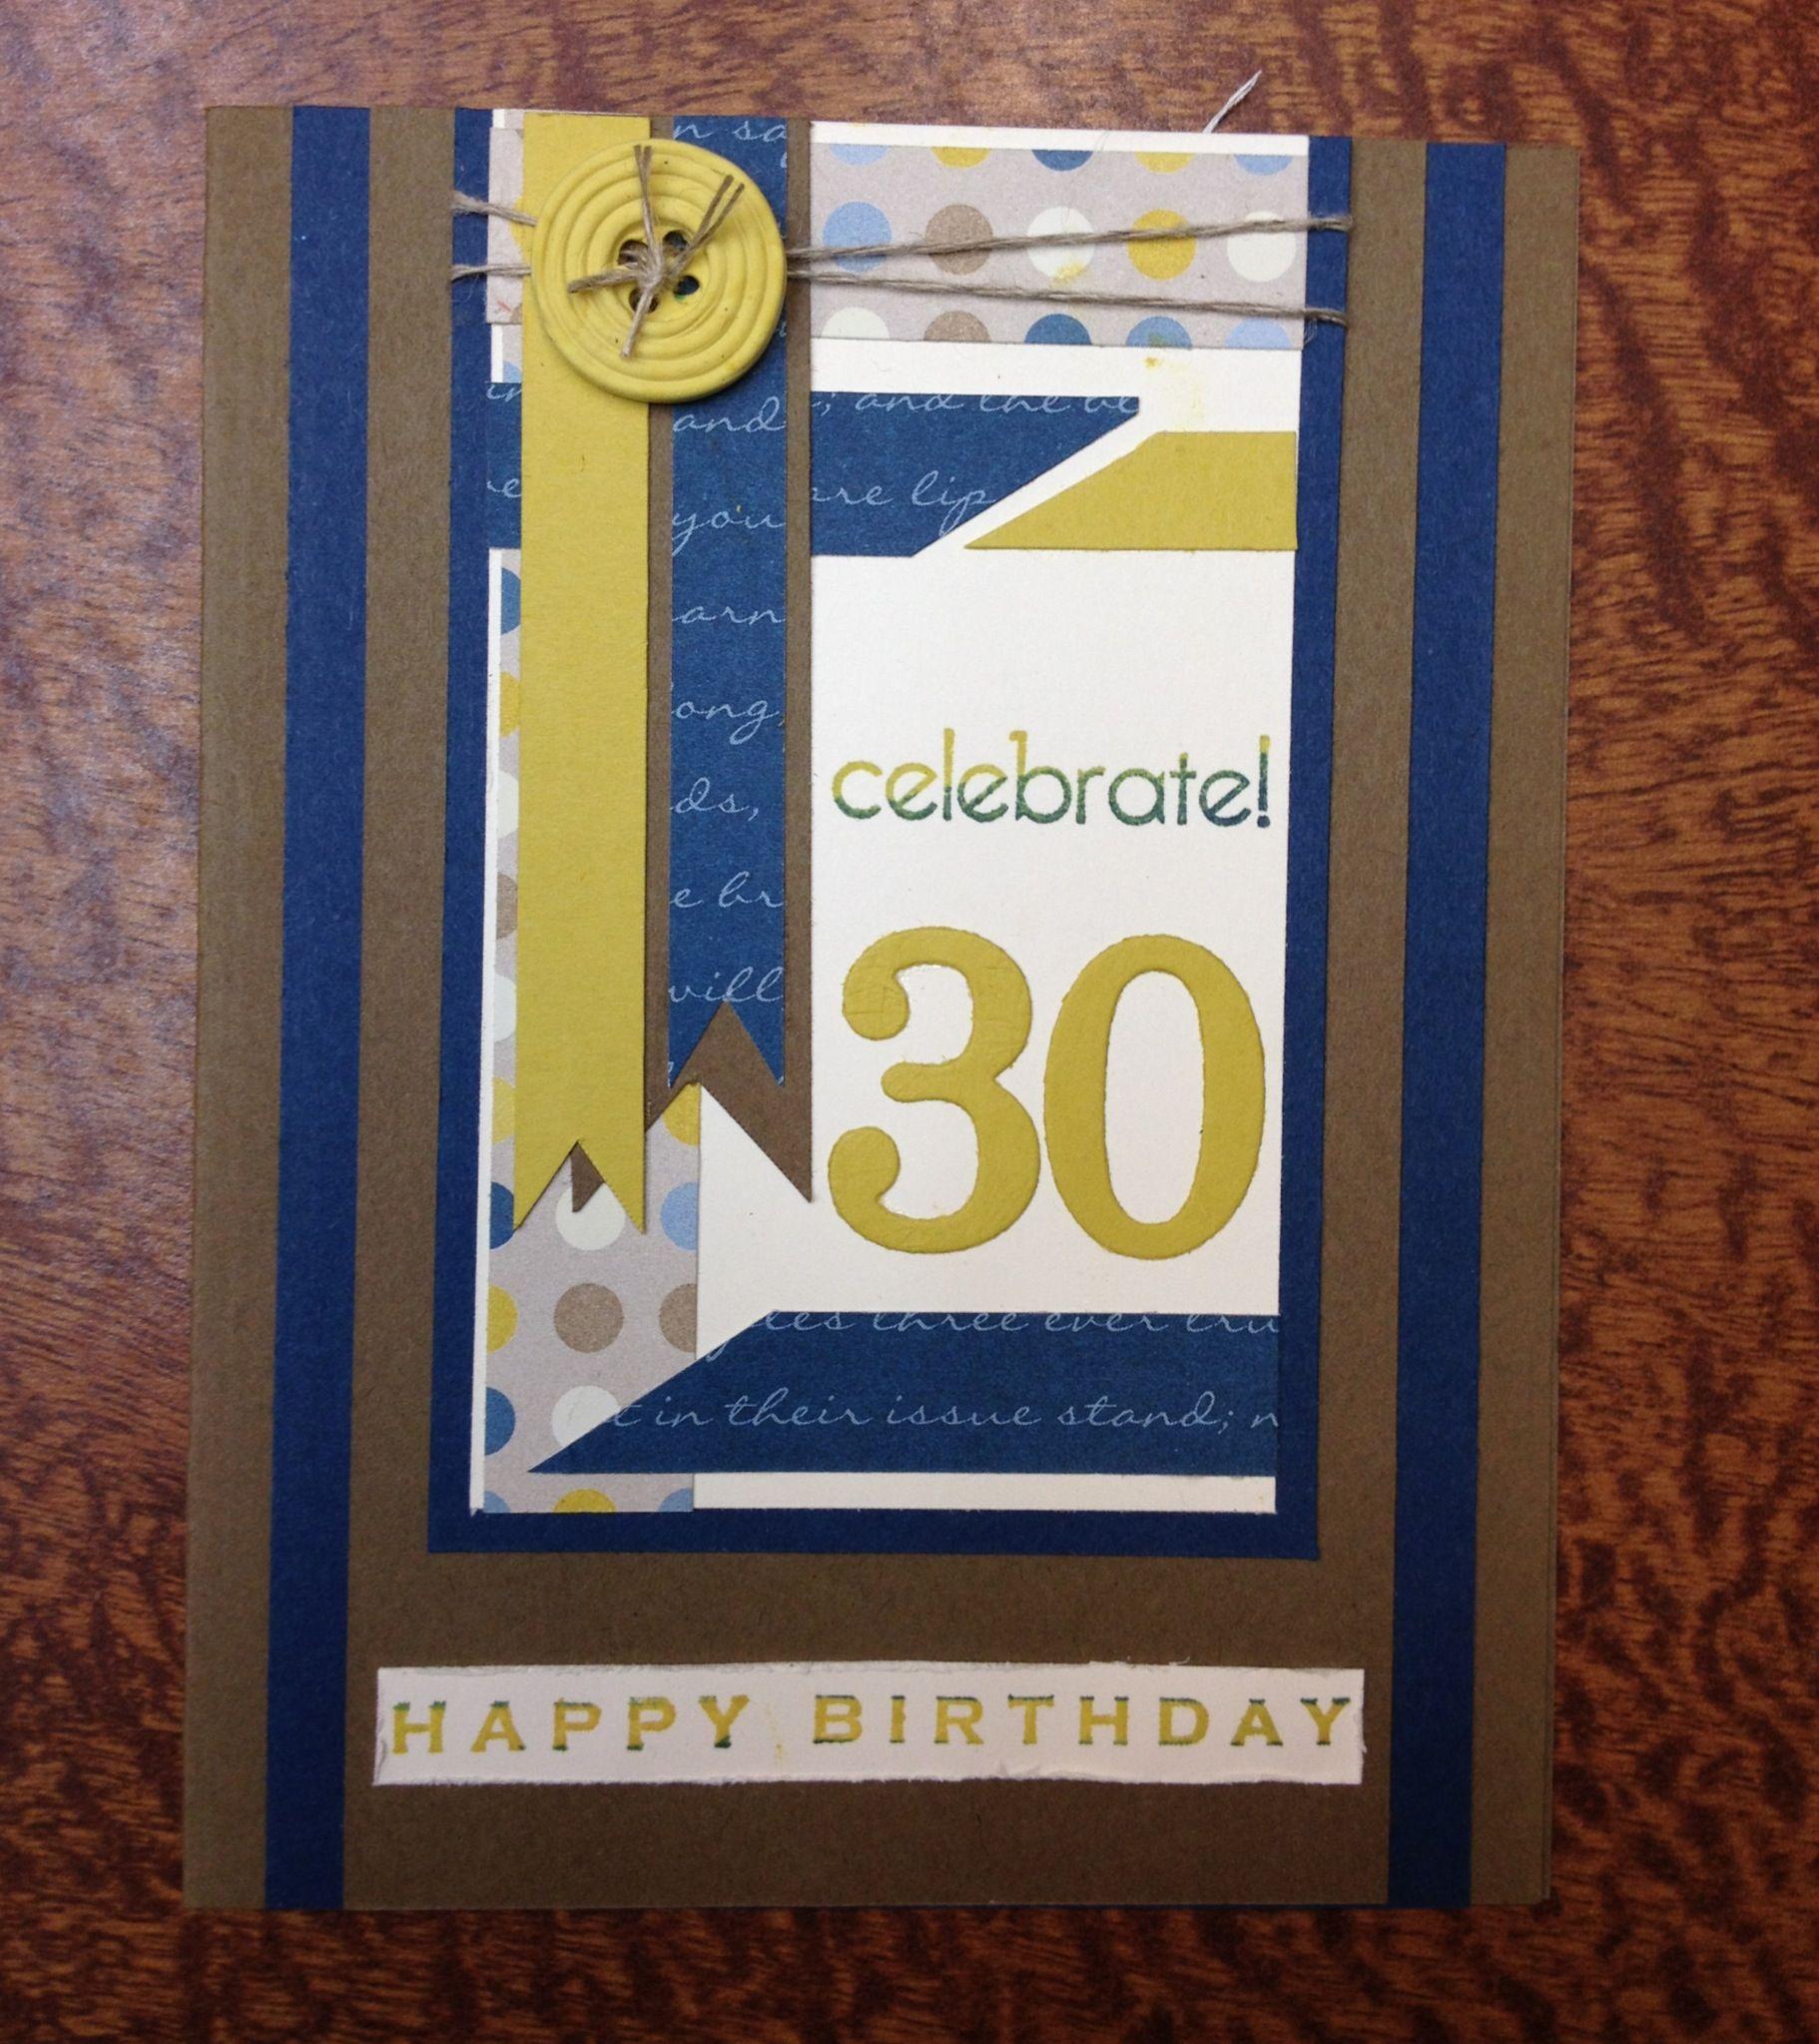 Oldest Son S 30th Birthday Card 30th Birthday Cards Cards Birthday Cards